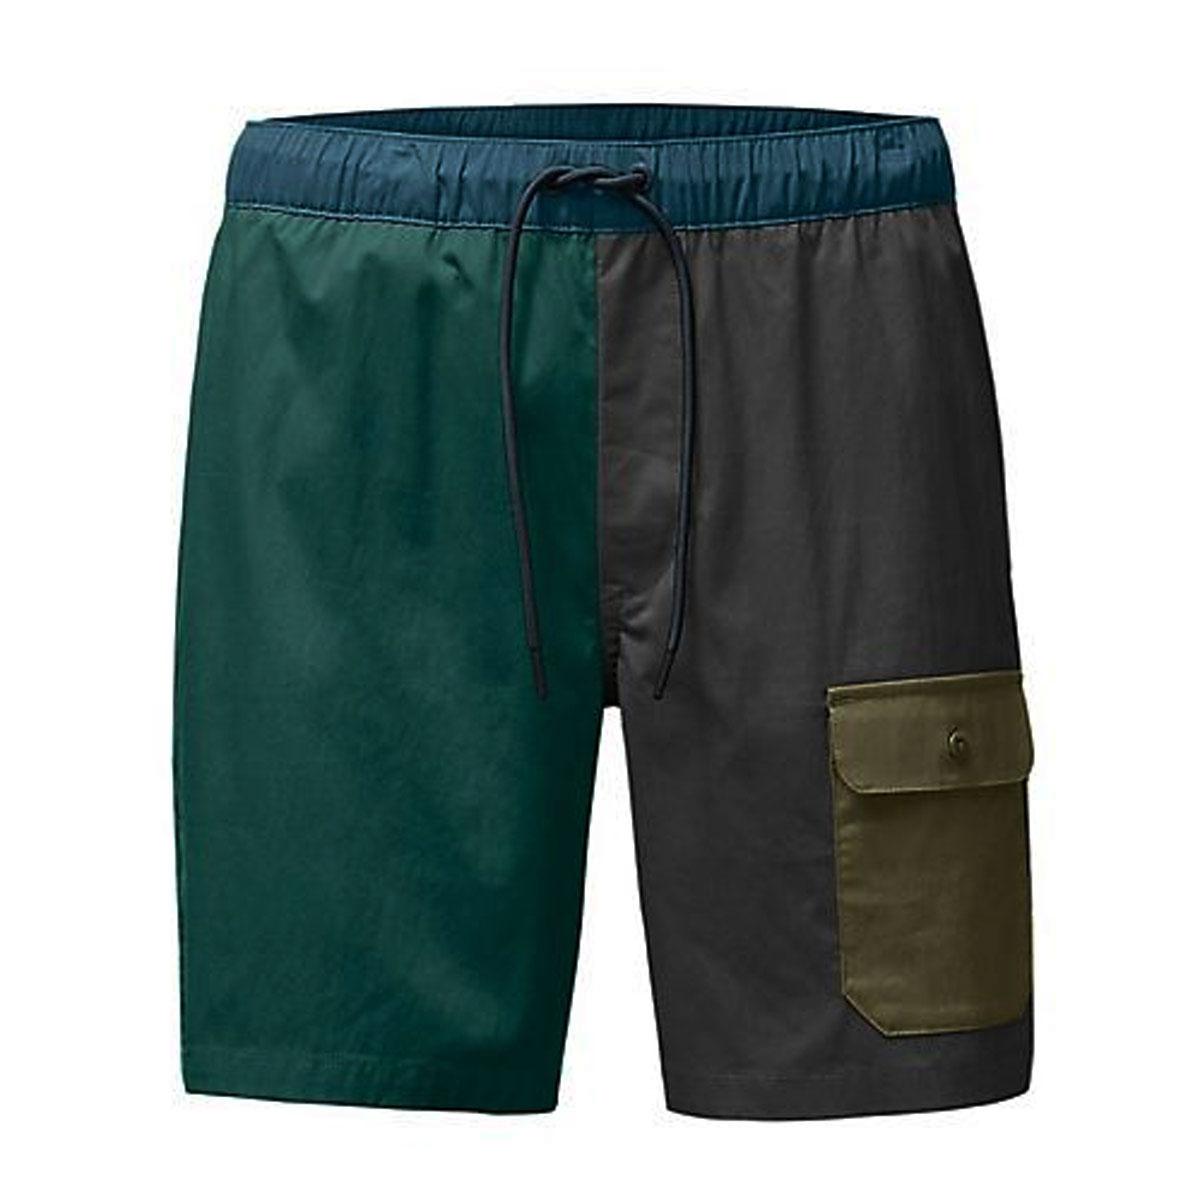 0100b6cc24 Clothing, Shoes & Accessories Enthusiastic The North Face Mens Khaki Nylon Swim  Trunks Shorts Sz M